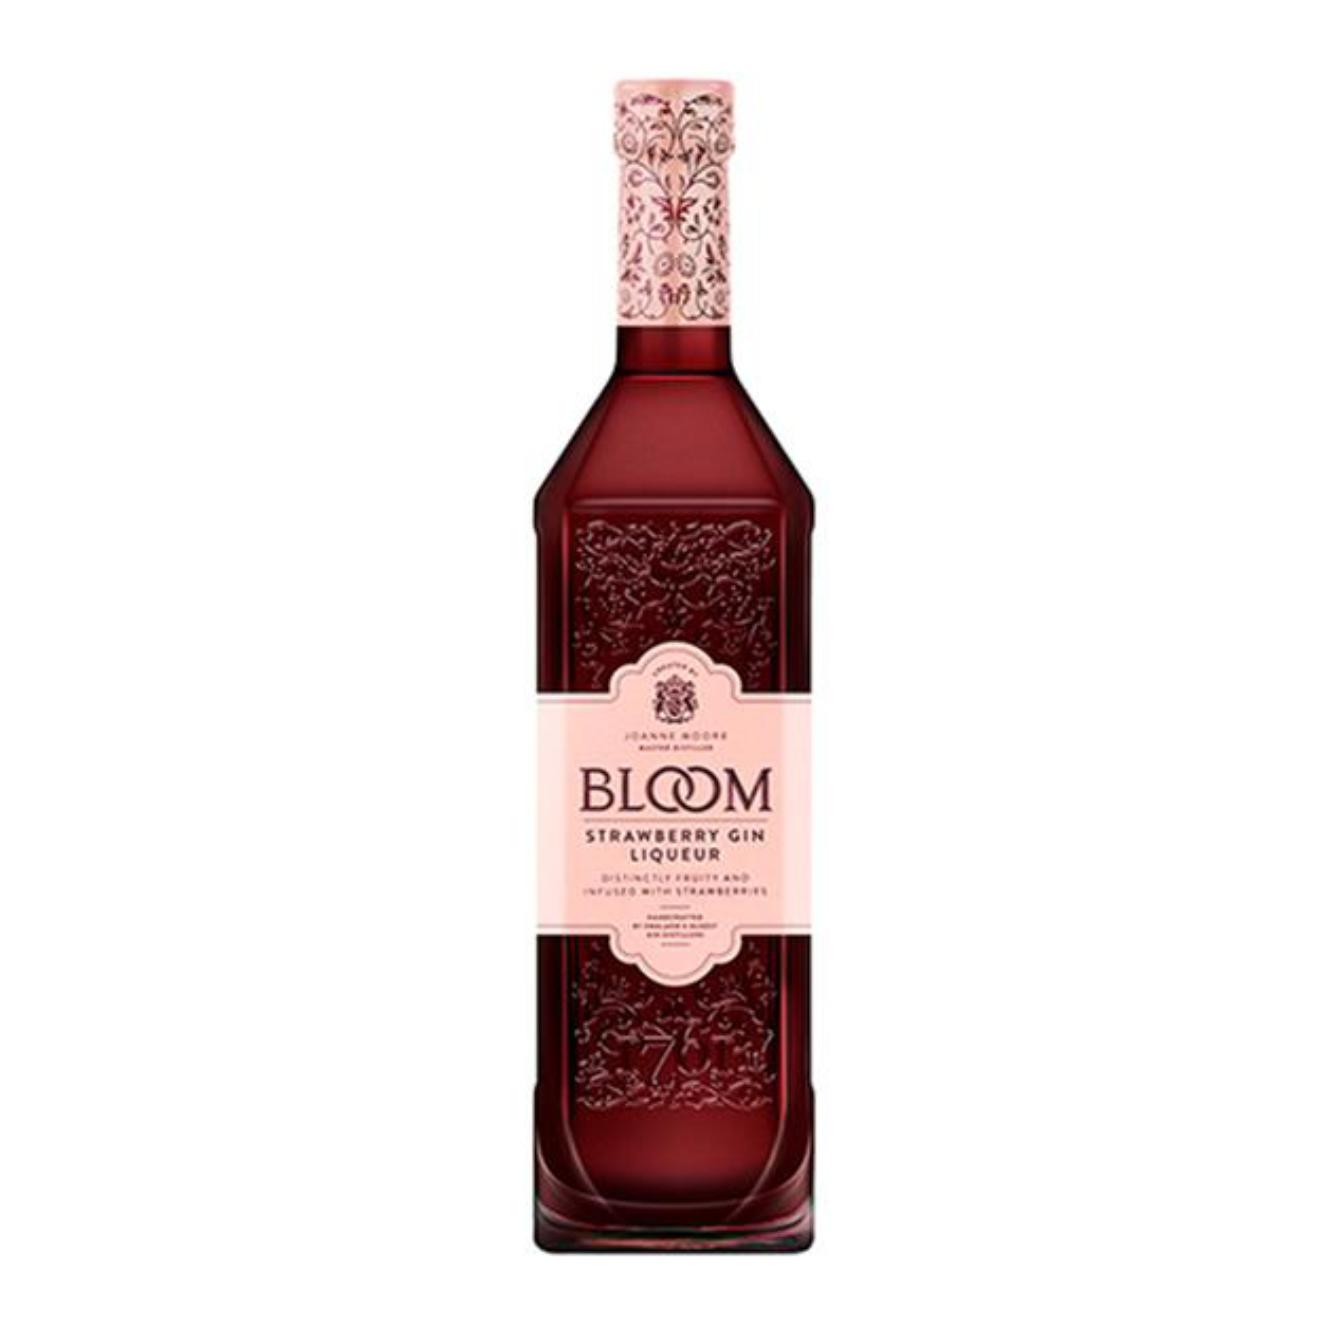 Bloom Strawberry Gin Liqueur